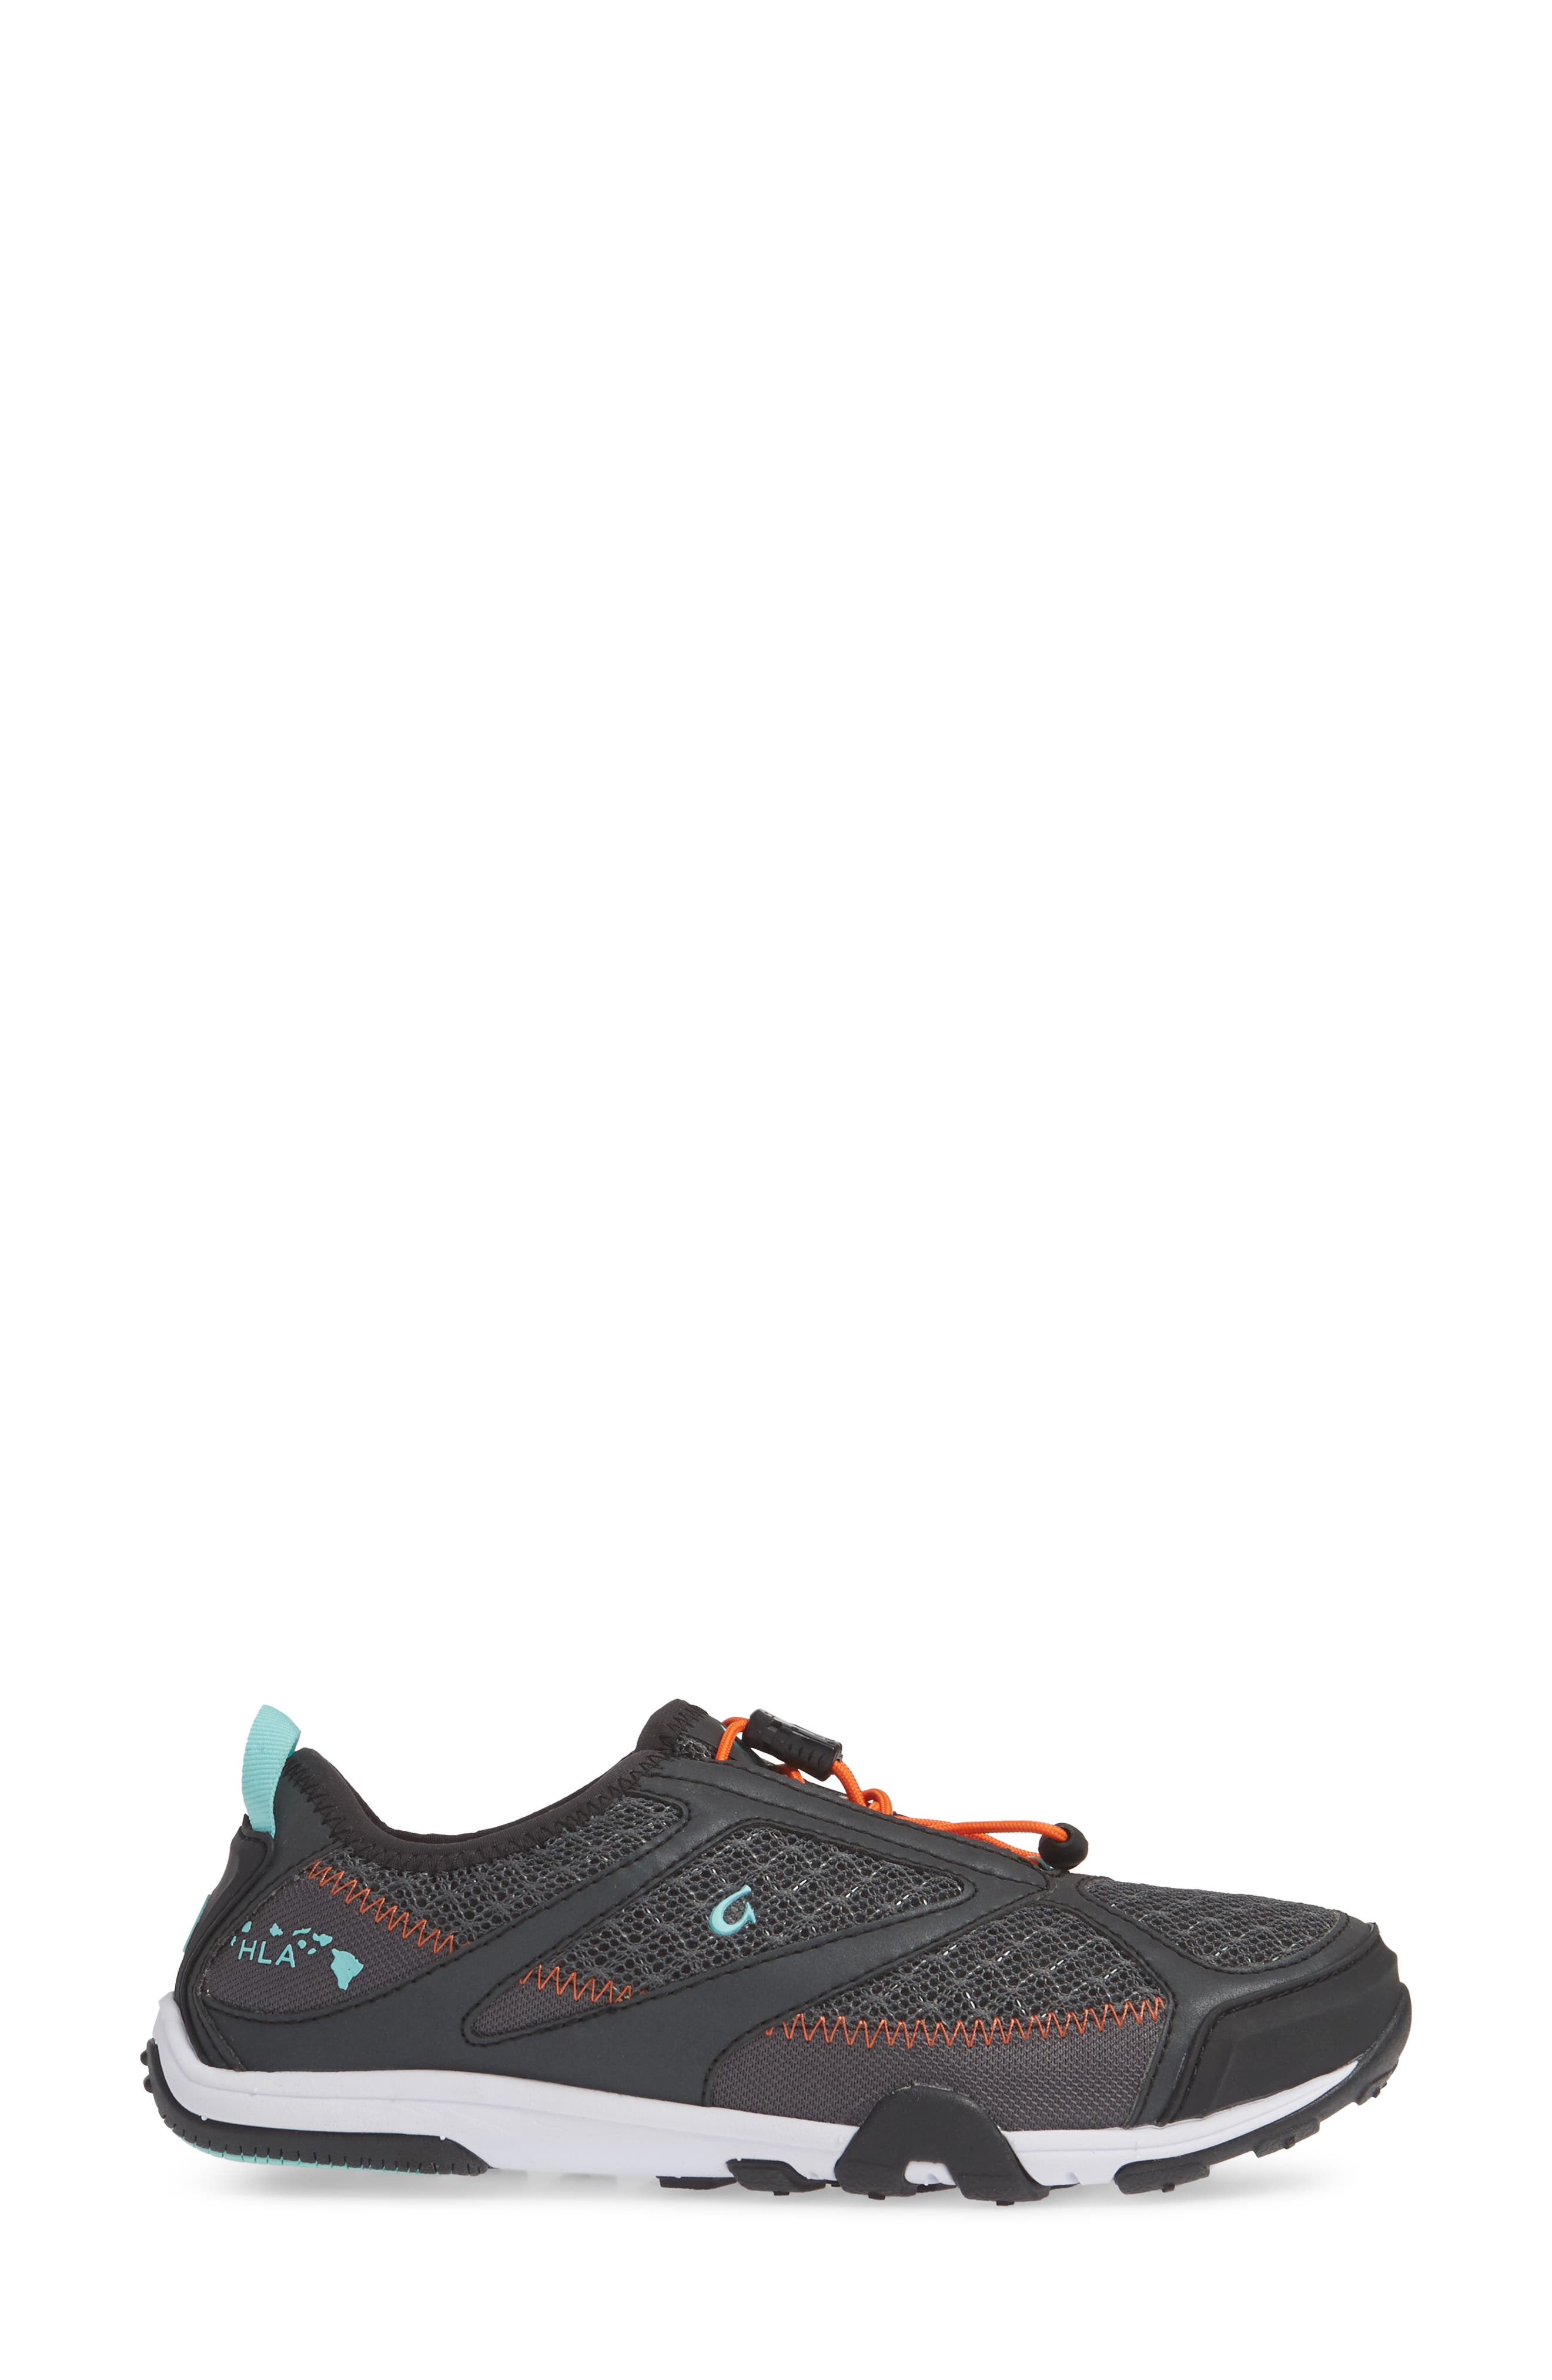 'Eleu' Water-Resistant Sneaker,                             Alternate thumbnail 3, color,                             DARK SHADOW/ LAVA ROCK FABRIC